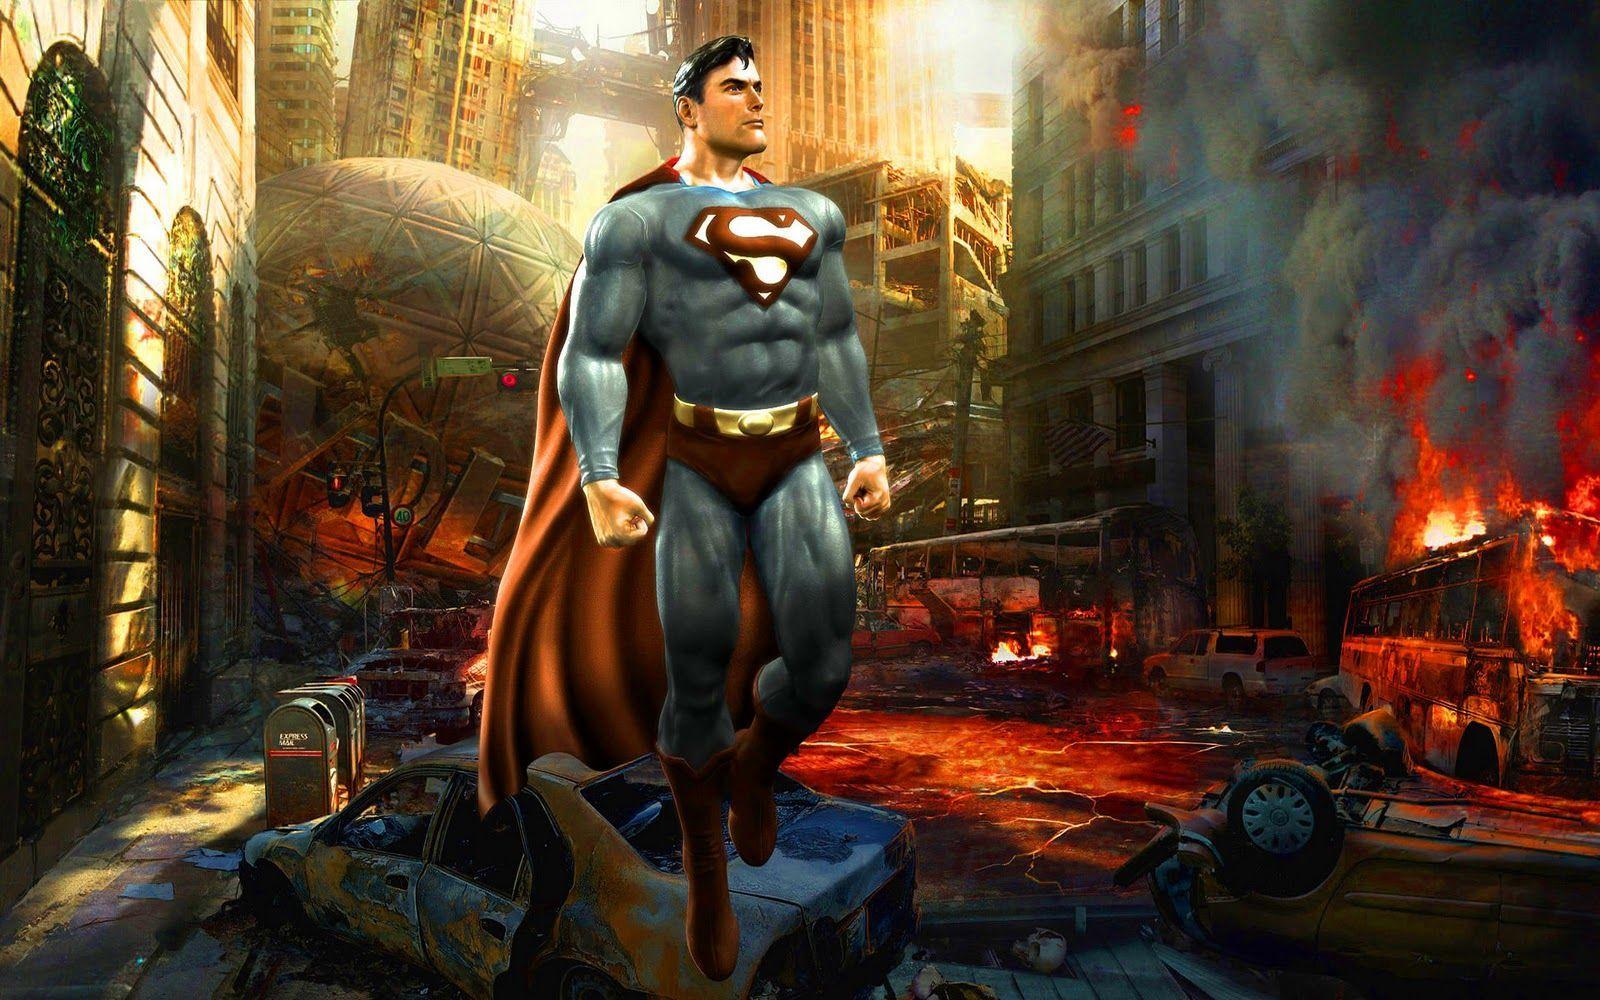 Superman Wallpapers 1080p - Wallpaper Cave